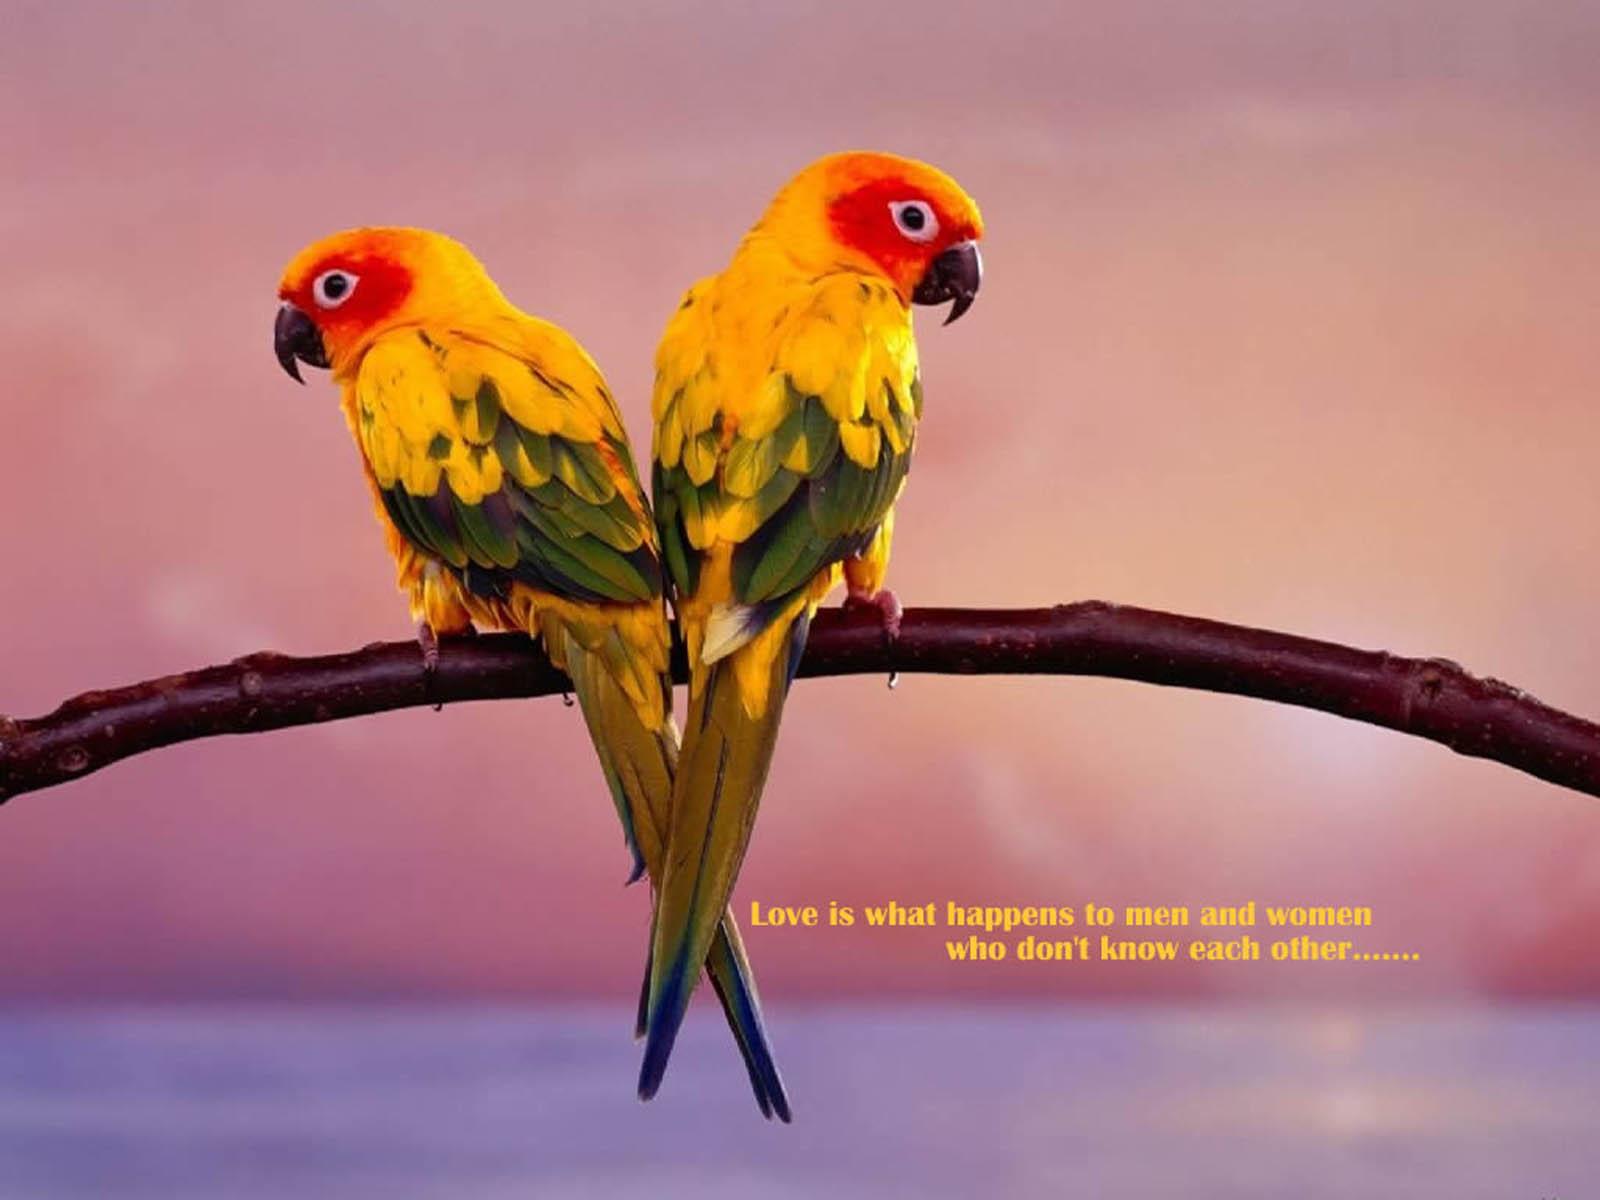 mp3 download free forever birds falcon wallpaper 1920x1080 birds